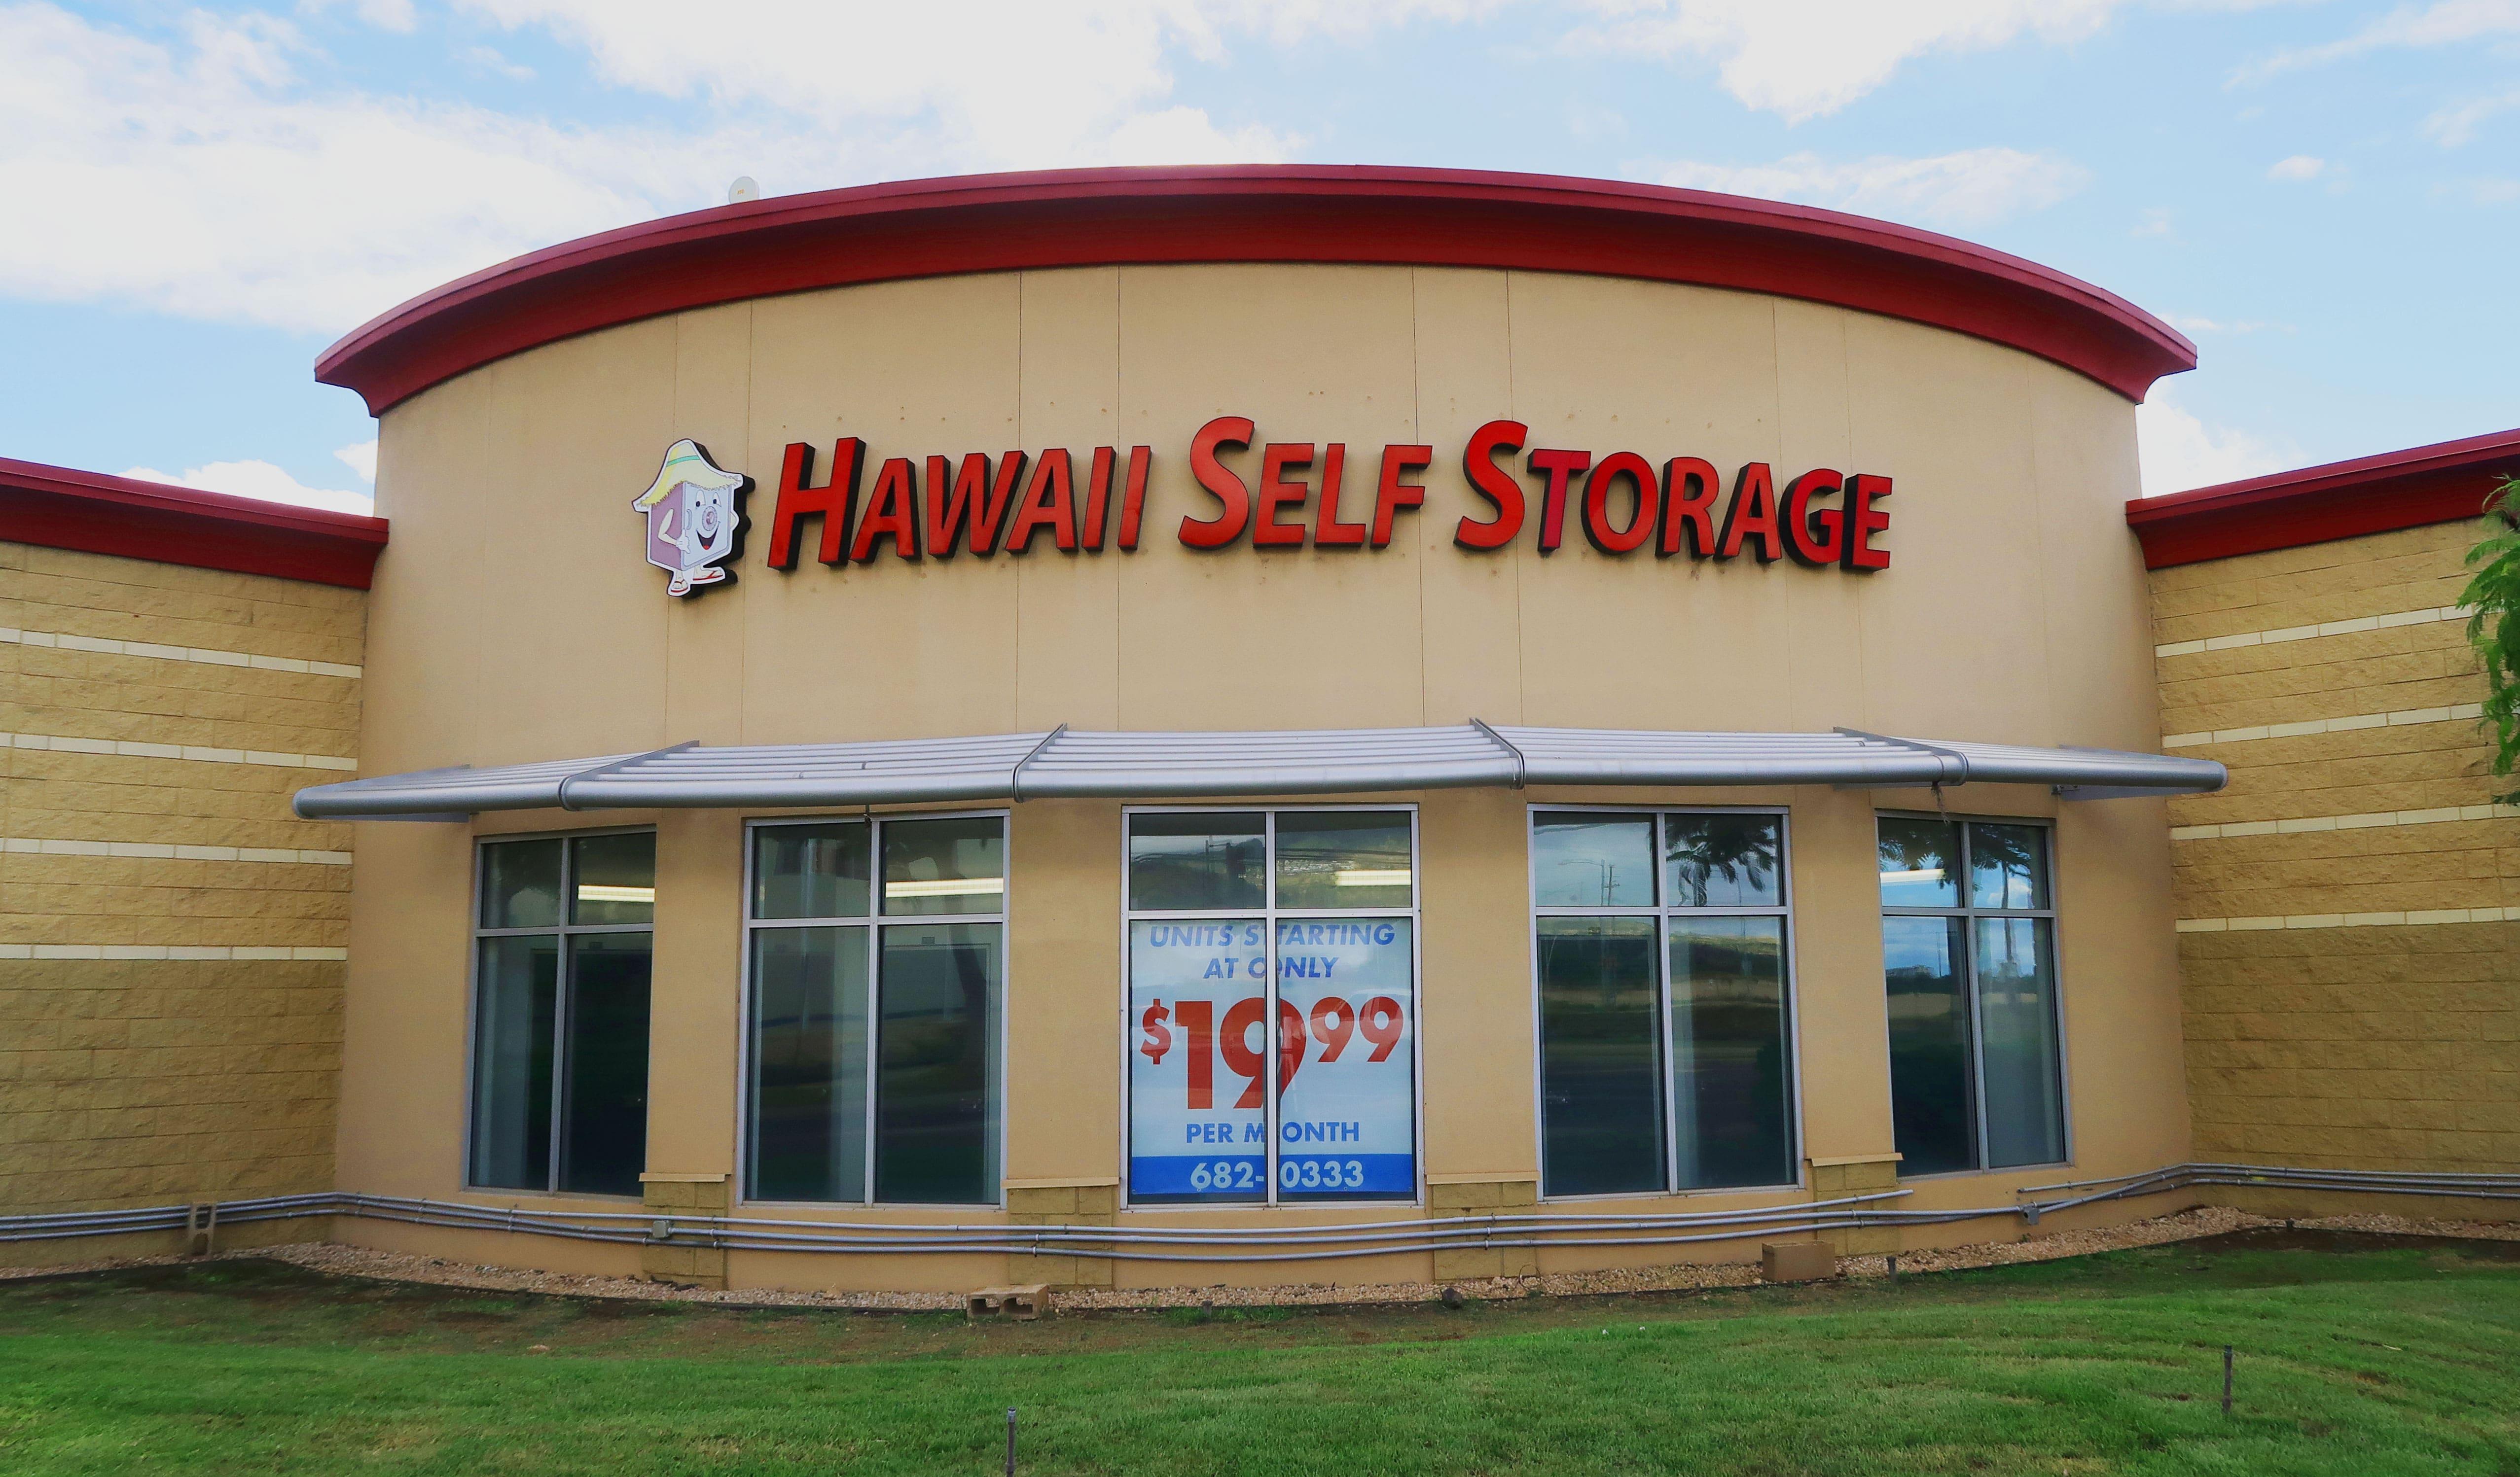 Hawaii Self Storage Kapolei-West